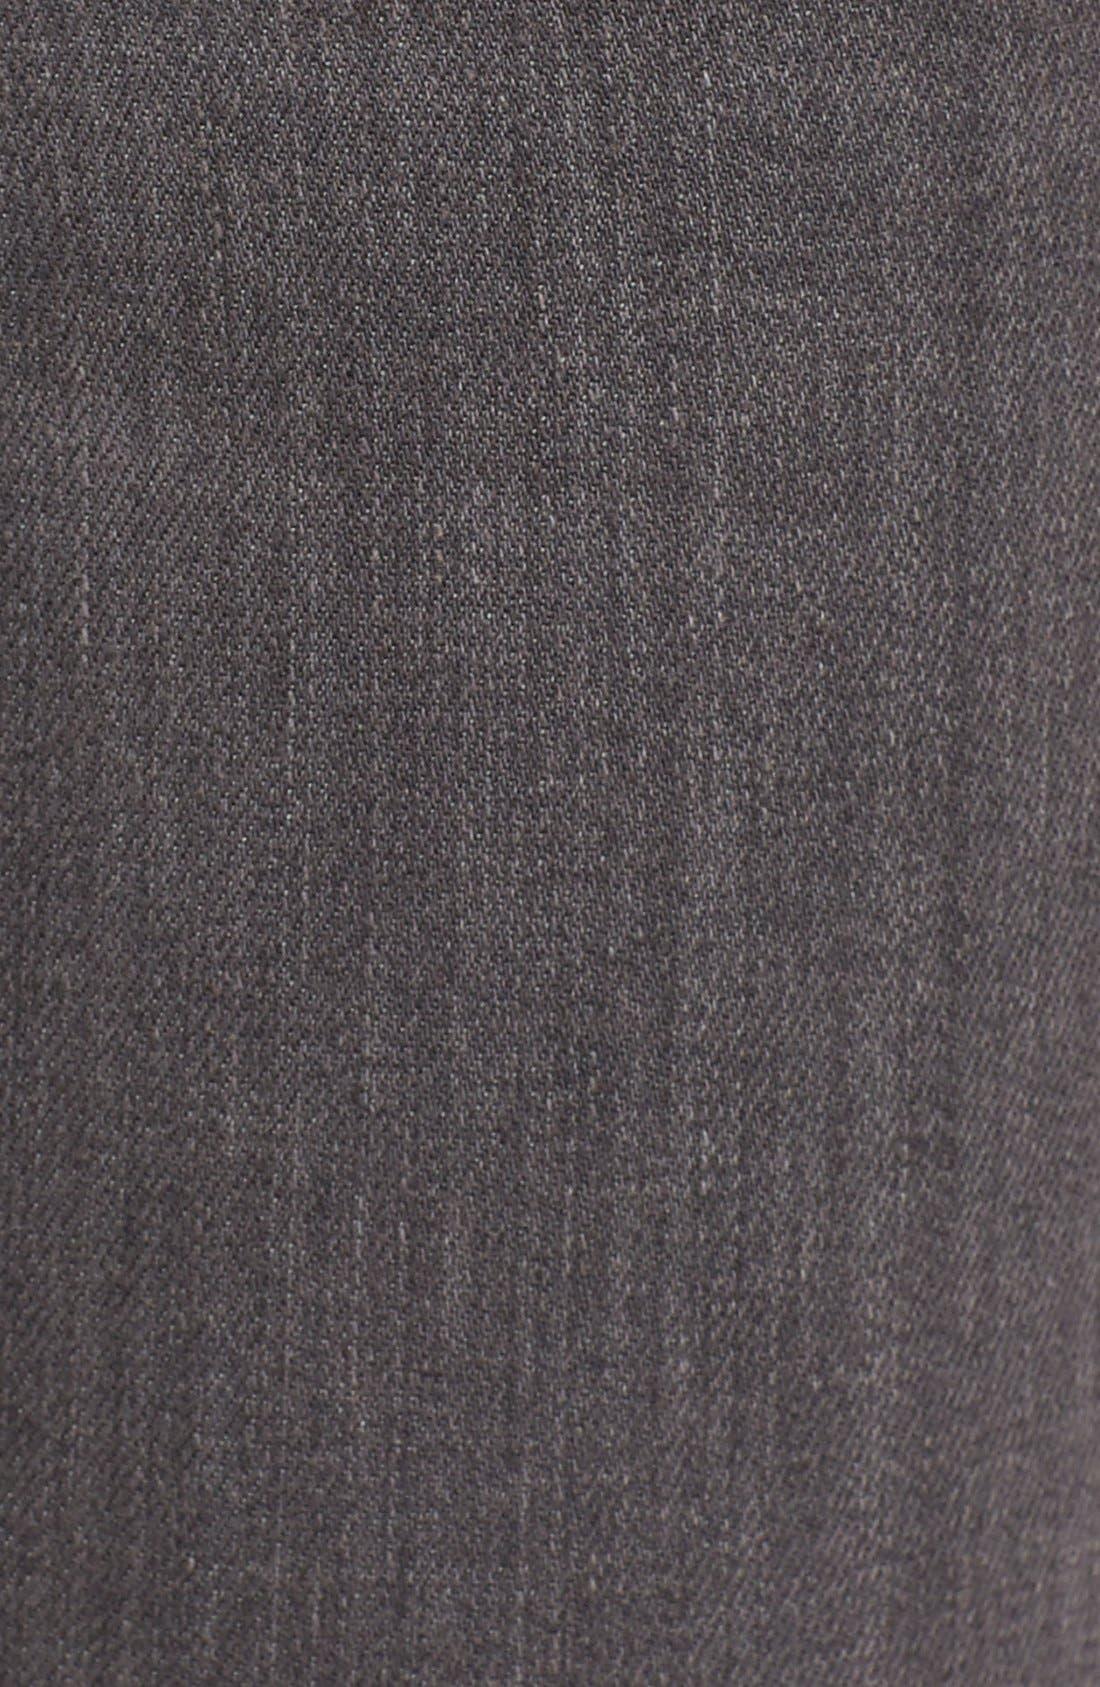 Alternate Image 5  - Rolla's 'Breakers' Distressed Skinny Jeans (Beaten Black)